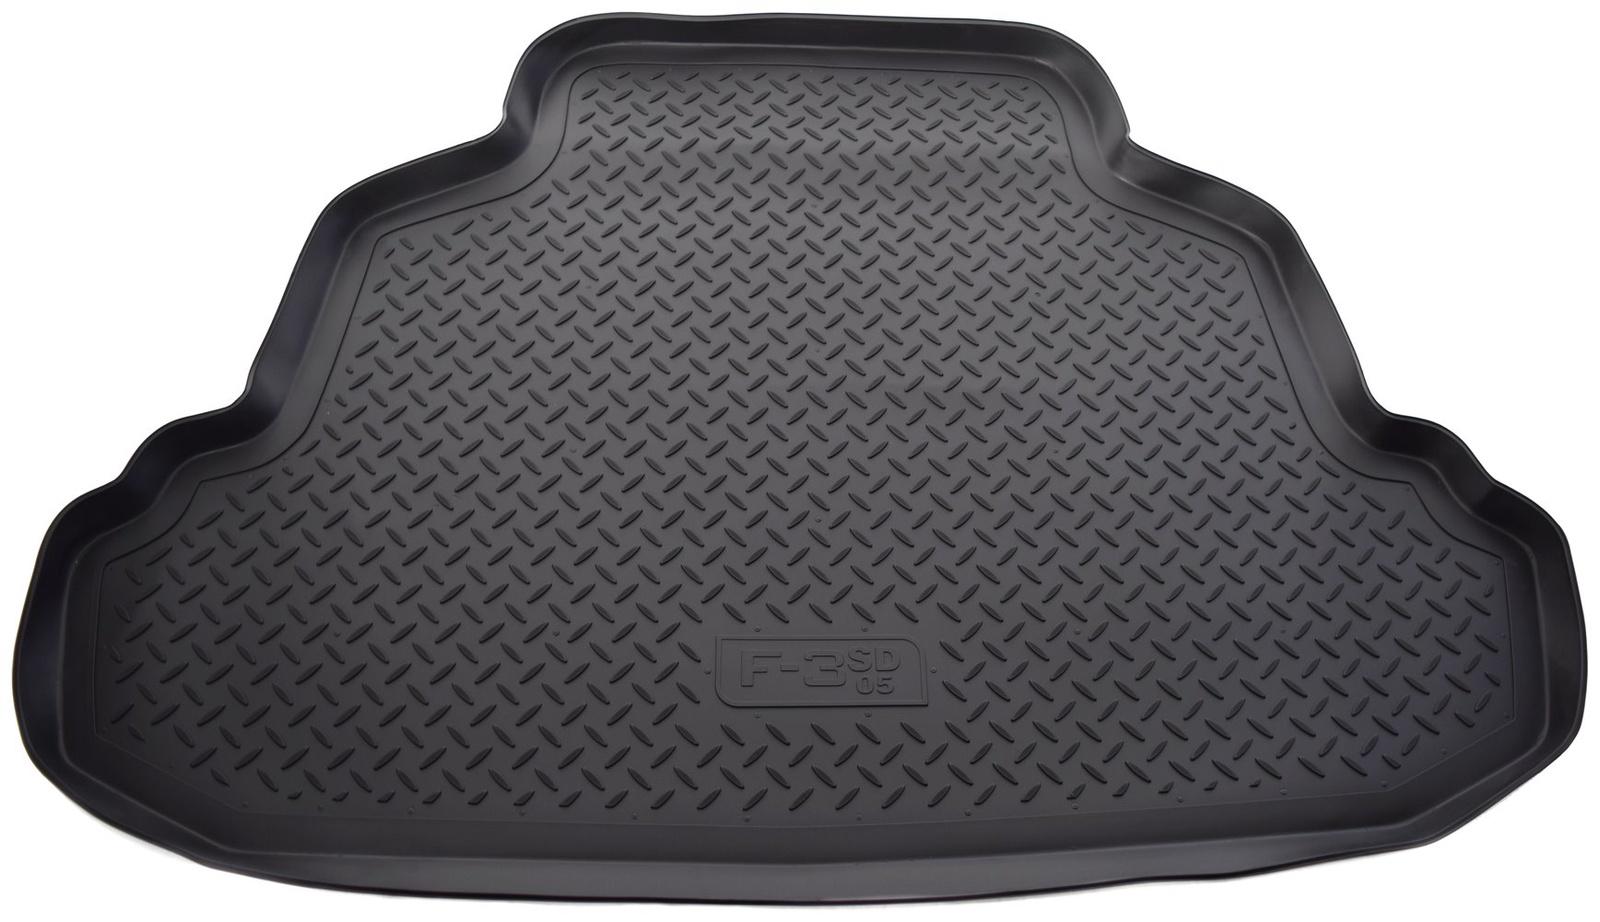 цена на Коврик в багажник Norplast NPL-P-18-03